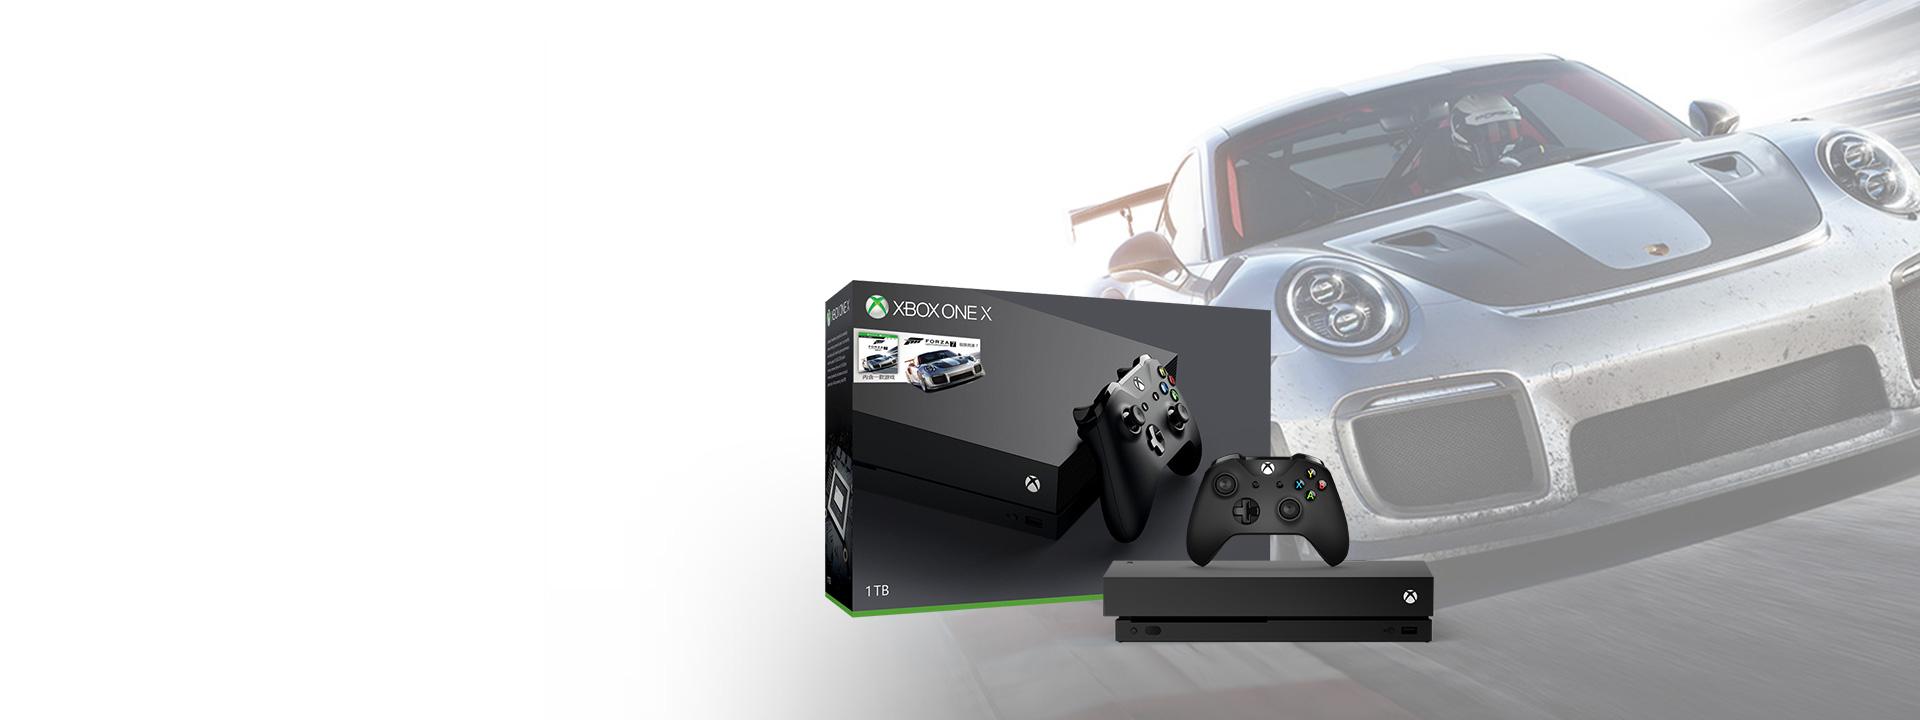 Xbox One X 1TB 消光黑限时12期免息